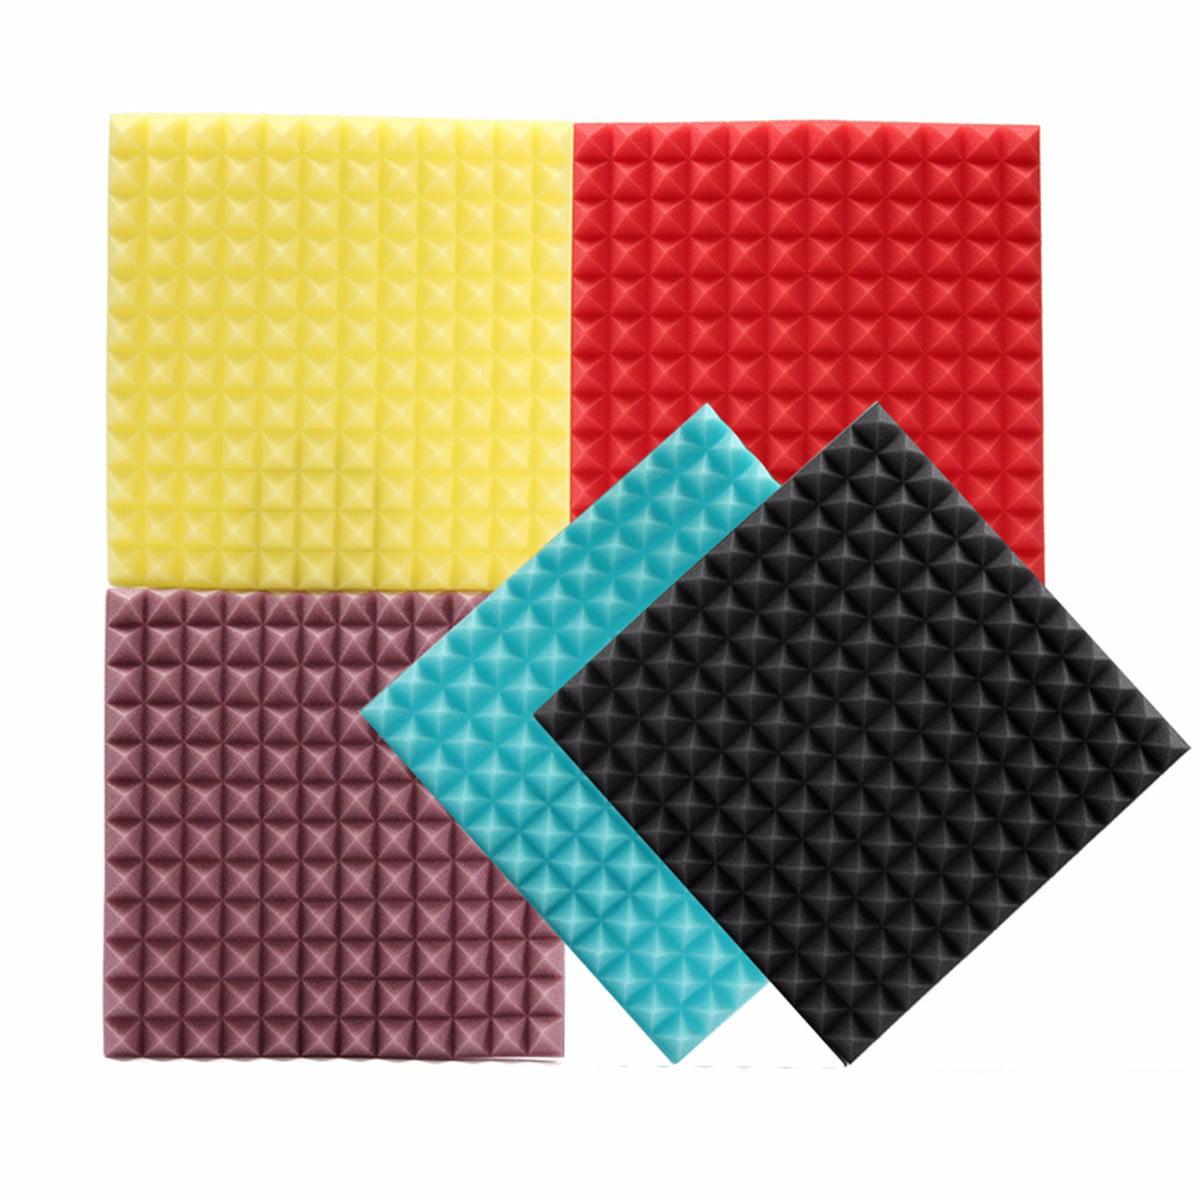 "1Pcs 12""x12""x1.2"" Acoustic Foam Panels Soundproofing Wedge Wall Tiles Sponge Insulation Sound For KTV Studio"